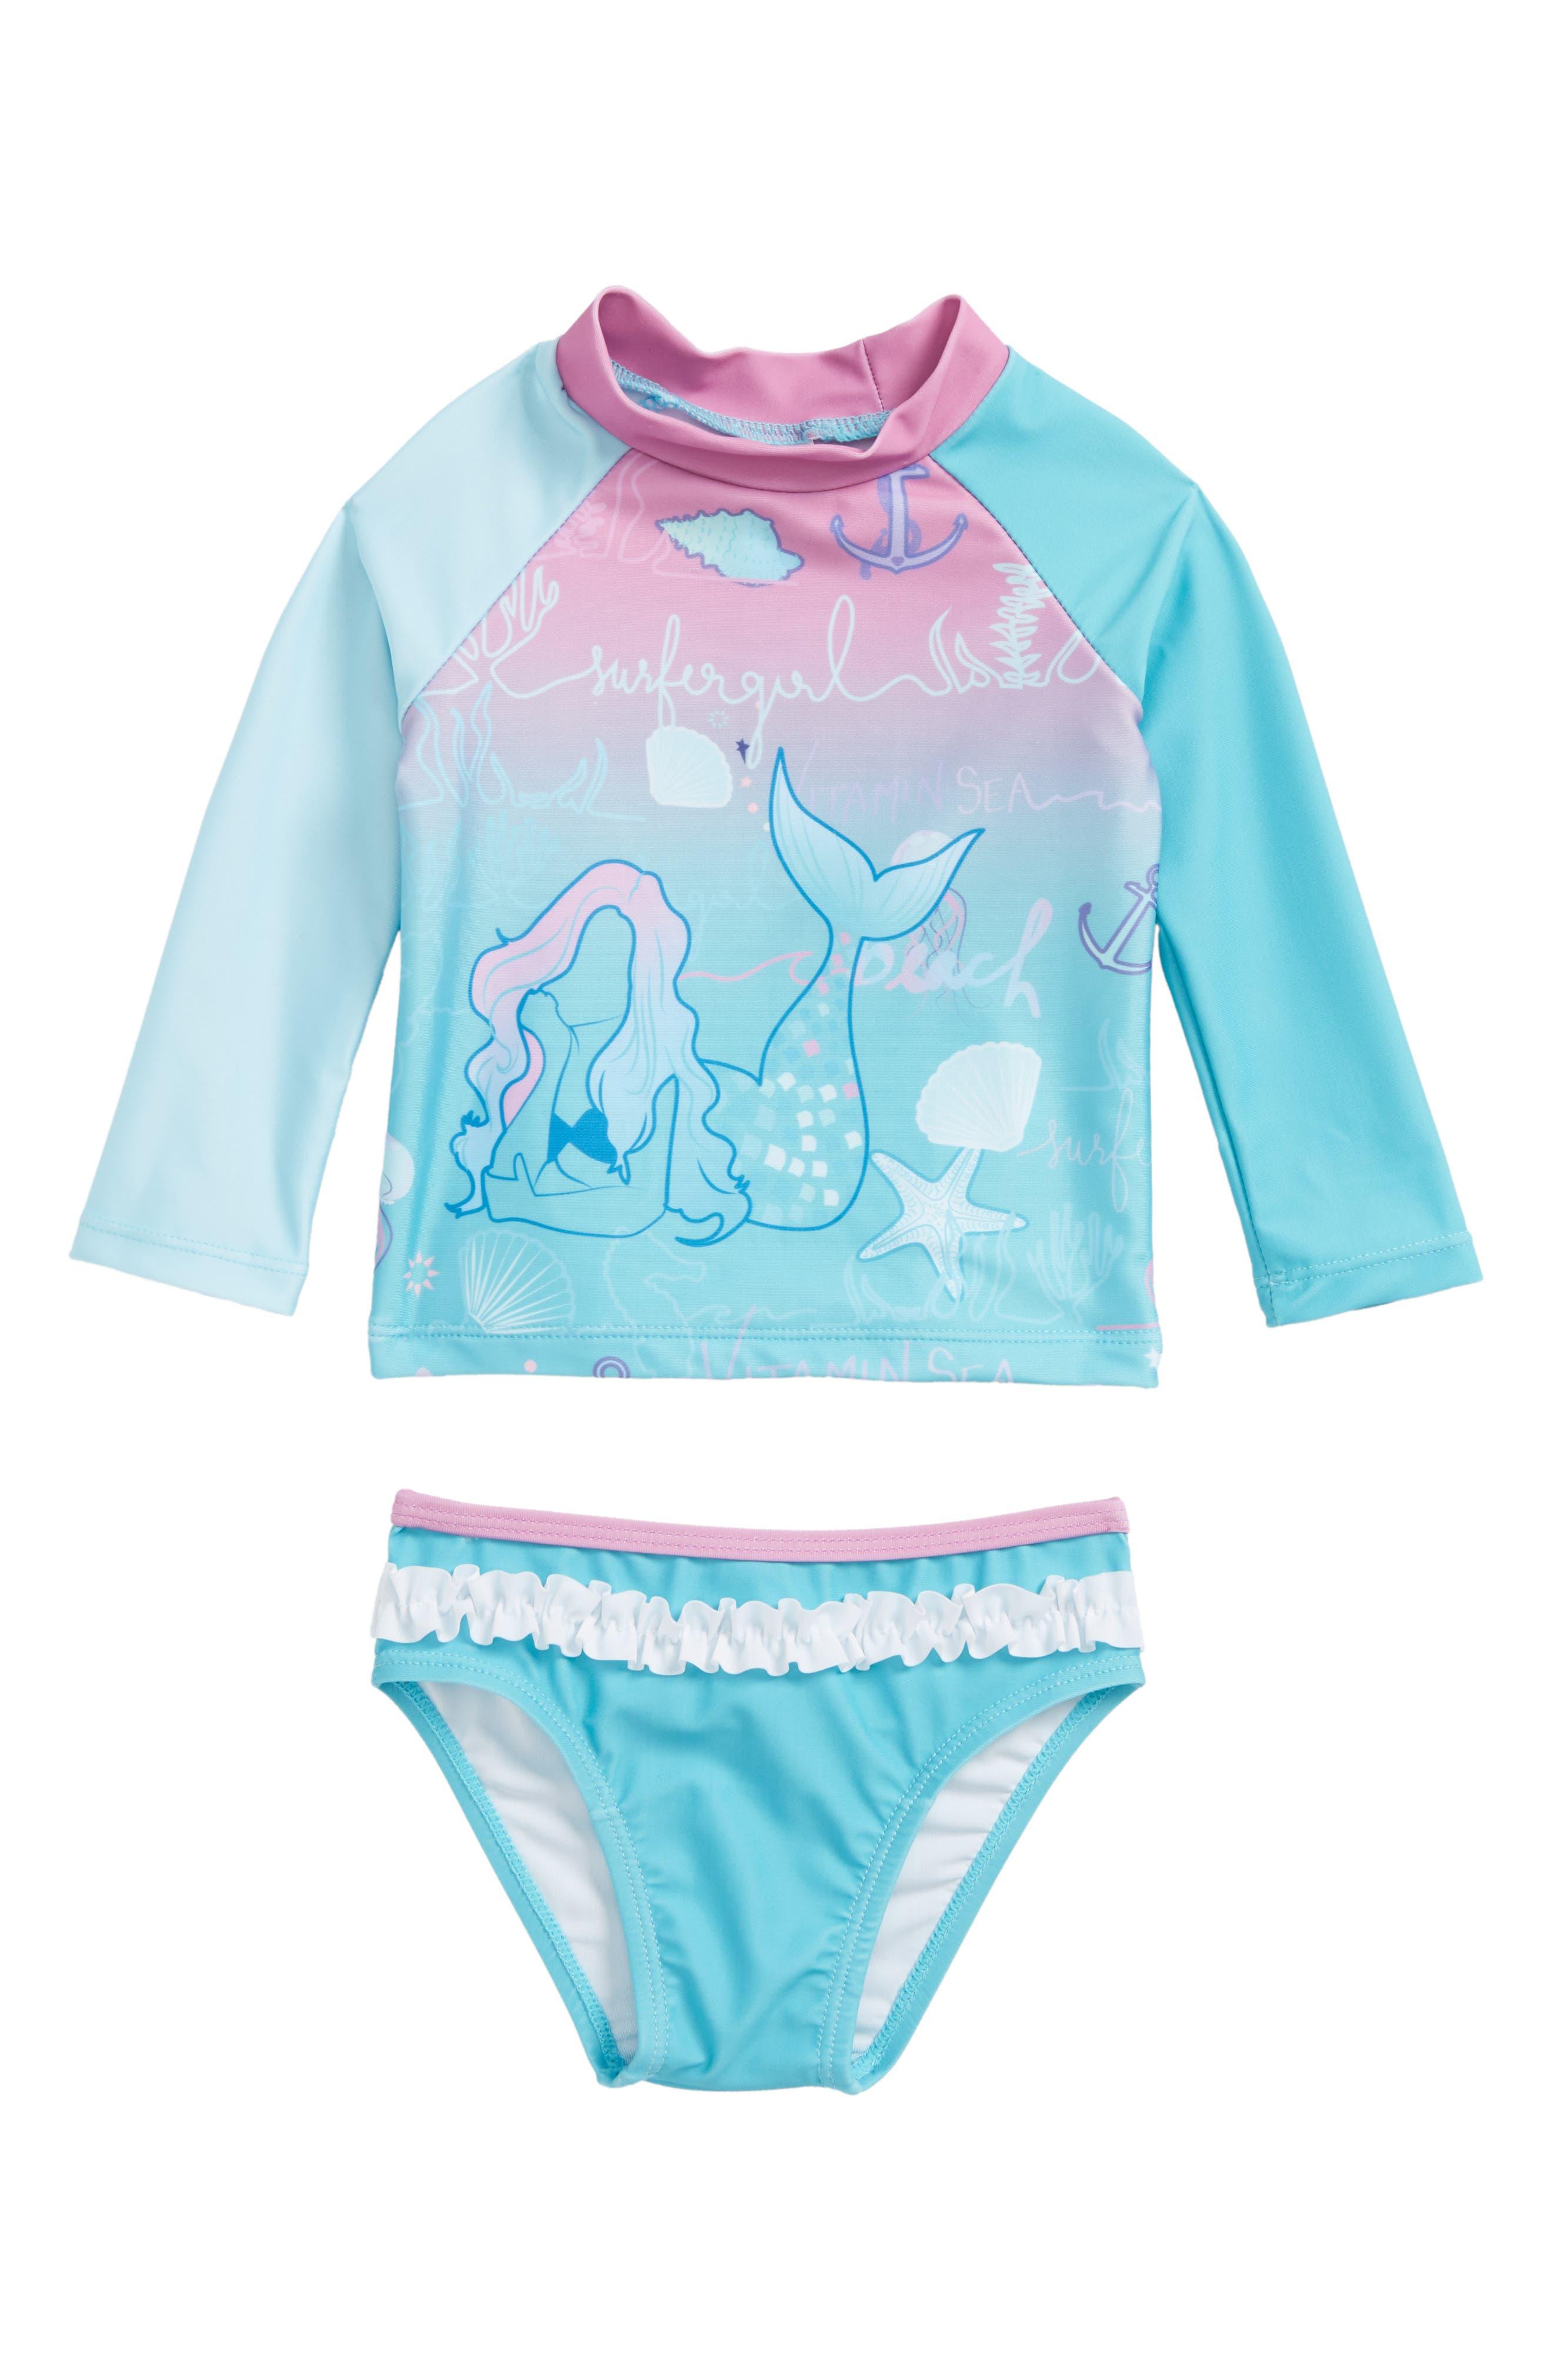 Two-Piece Rashguard Swimsuit,                         Main,                         color, 440